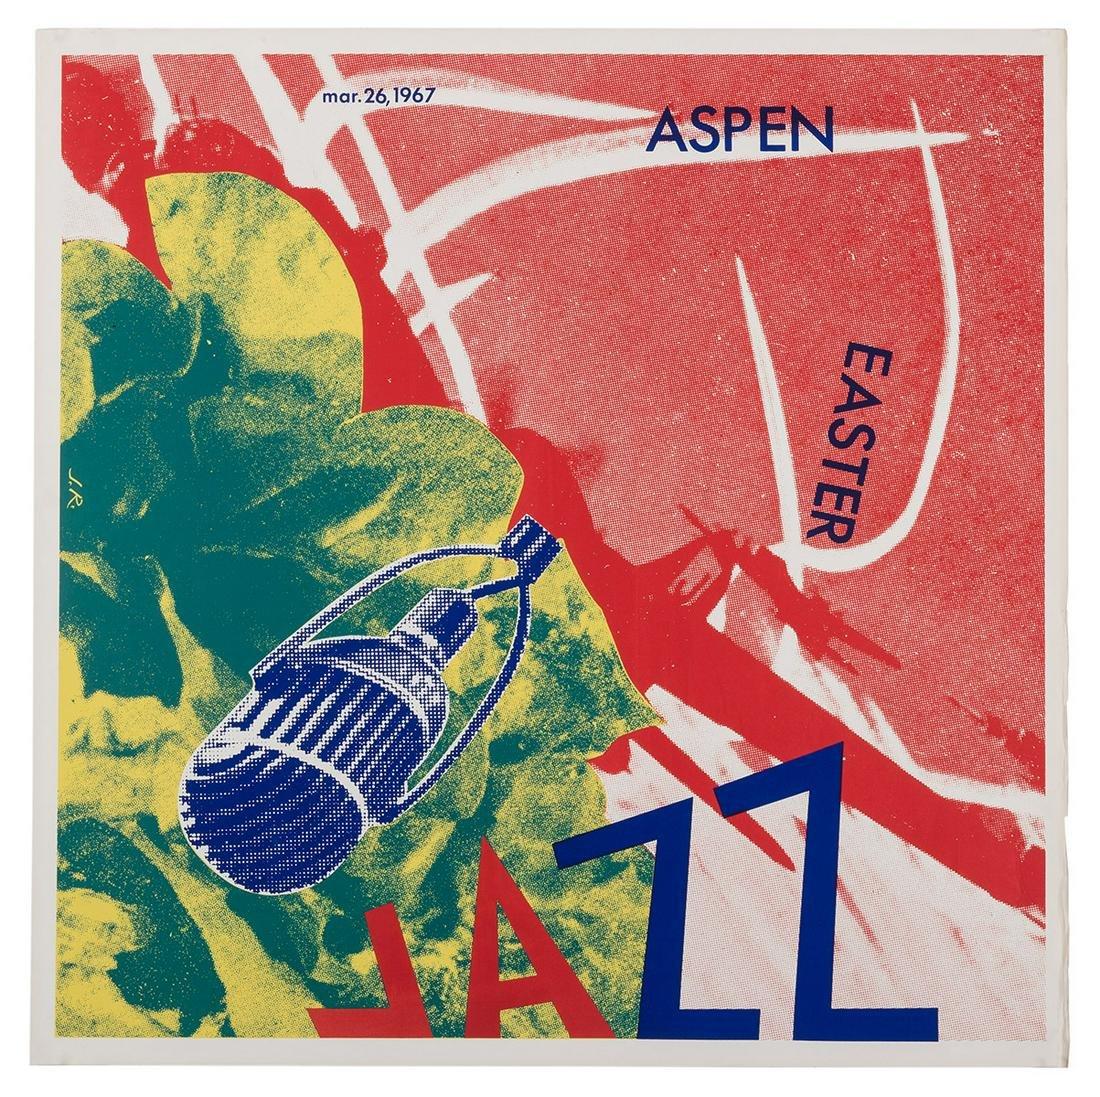 Rosenquist, James. Aspen Easter Jazz. March 26, 1967.